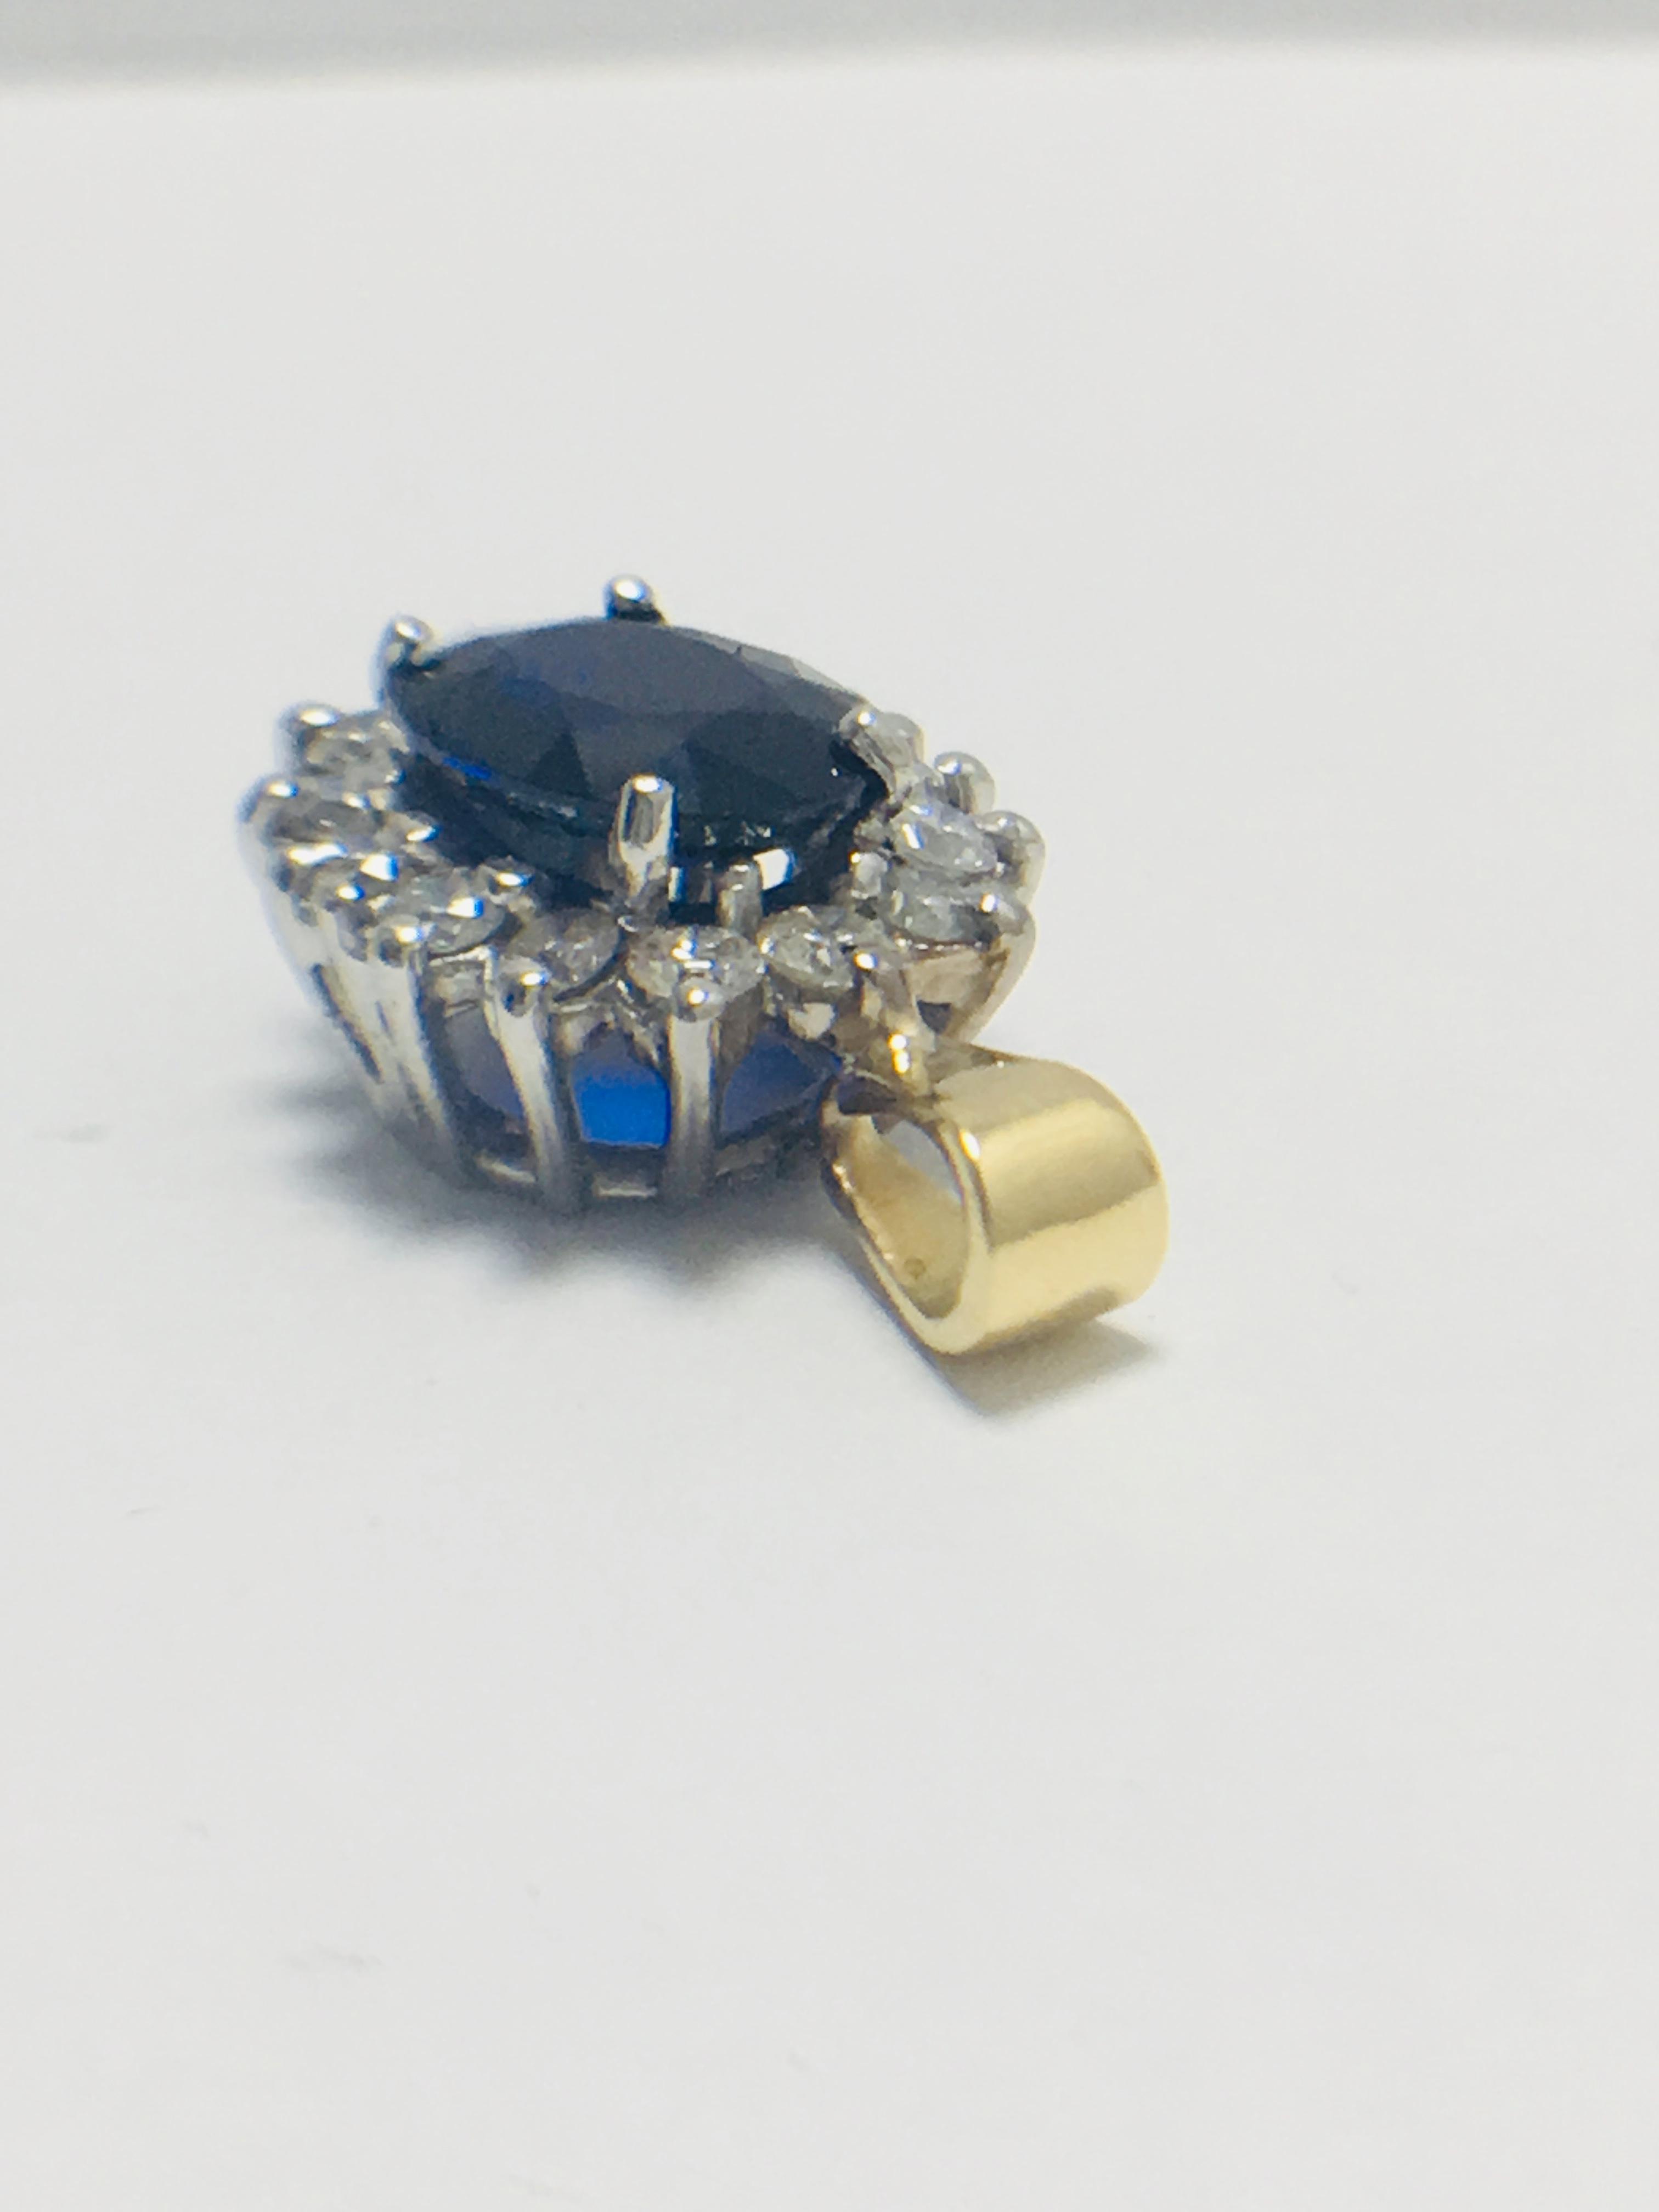 Sapphire and Diamond pendant,18ct gold - Image 2 of 7